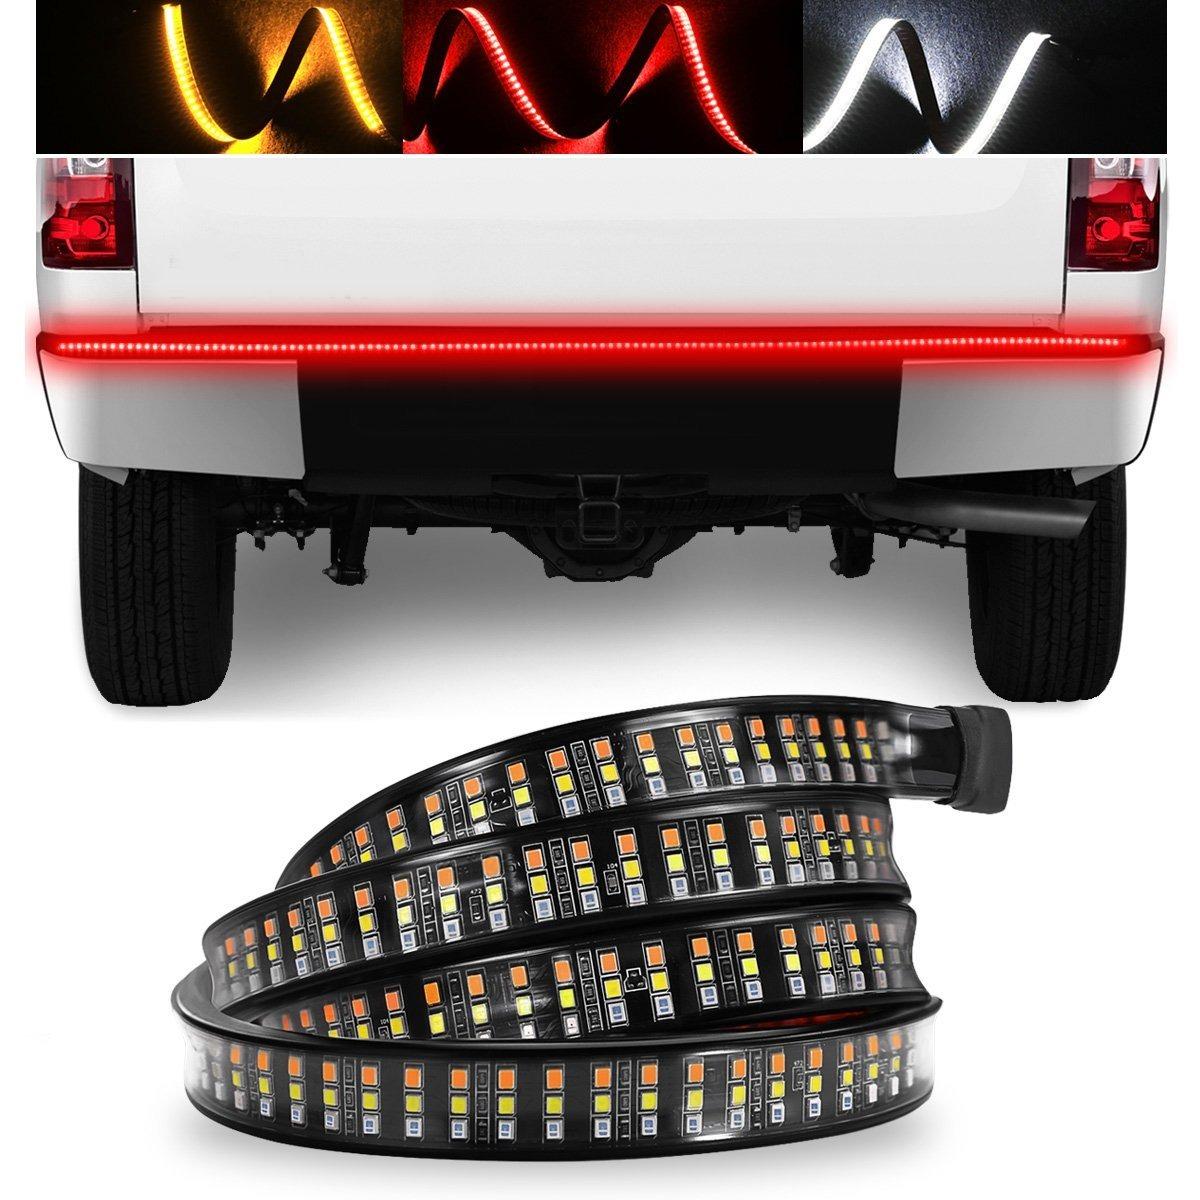 Tailgate light bar swatow industries triple row 60inch l cargando zoom aloadofball Gallery